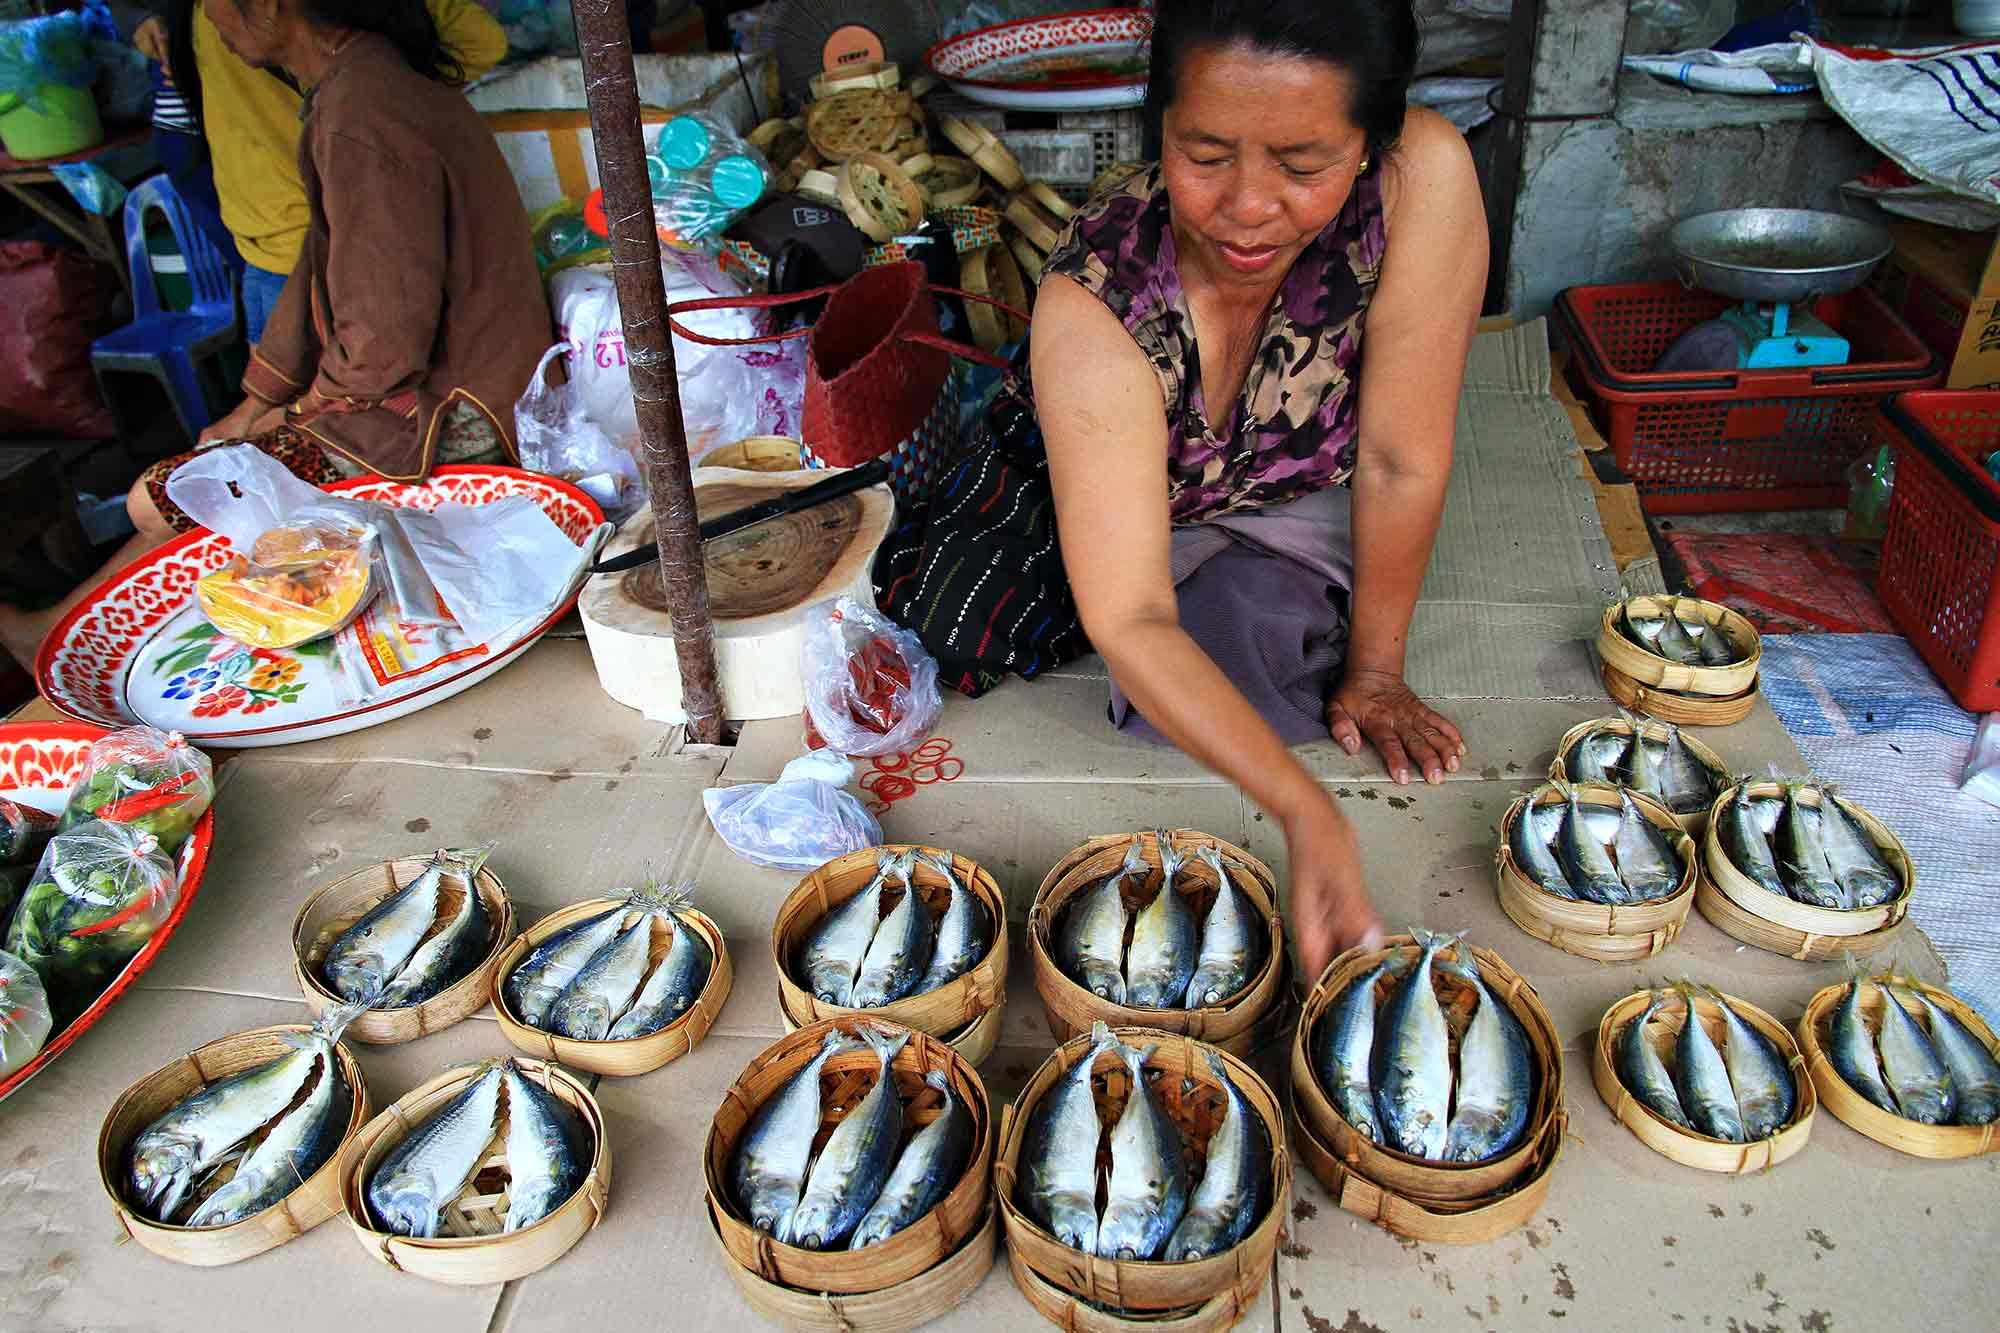 A market woman in Vientiane, Laos. © Ulli Maier & Nisa Maier